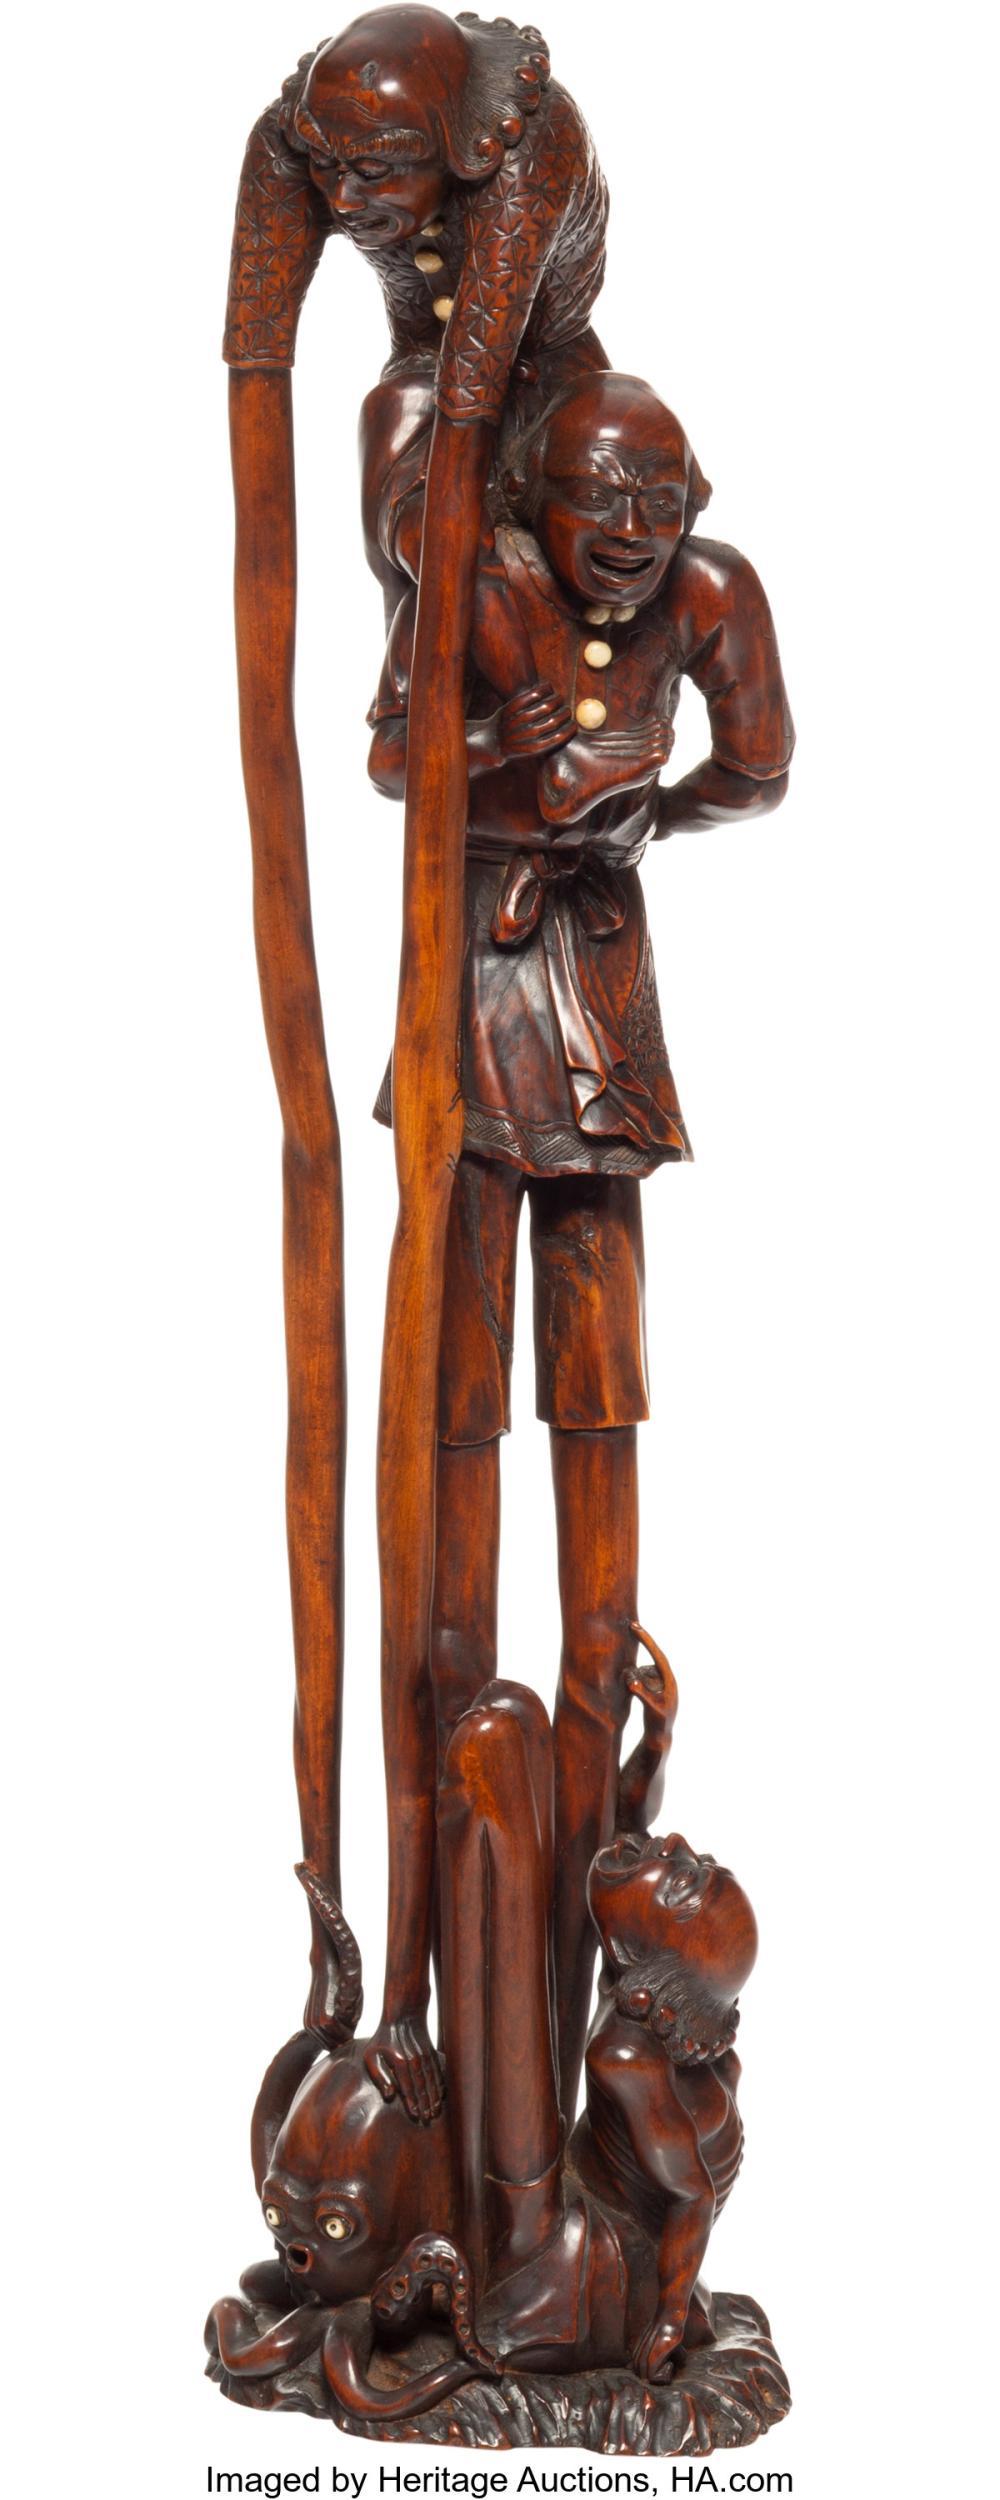 Lot 21251: A Japanese Carved Wood Ashinaga-Tenaga Figural Group, early 20th century 20-1/2